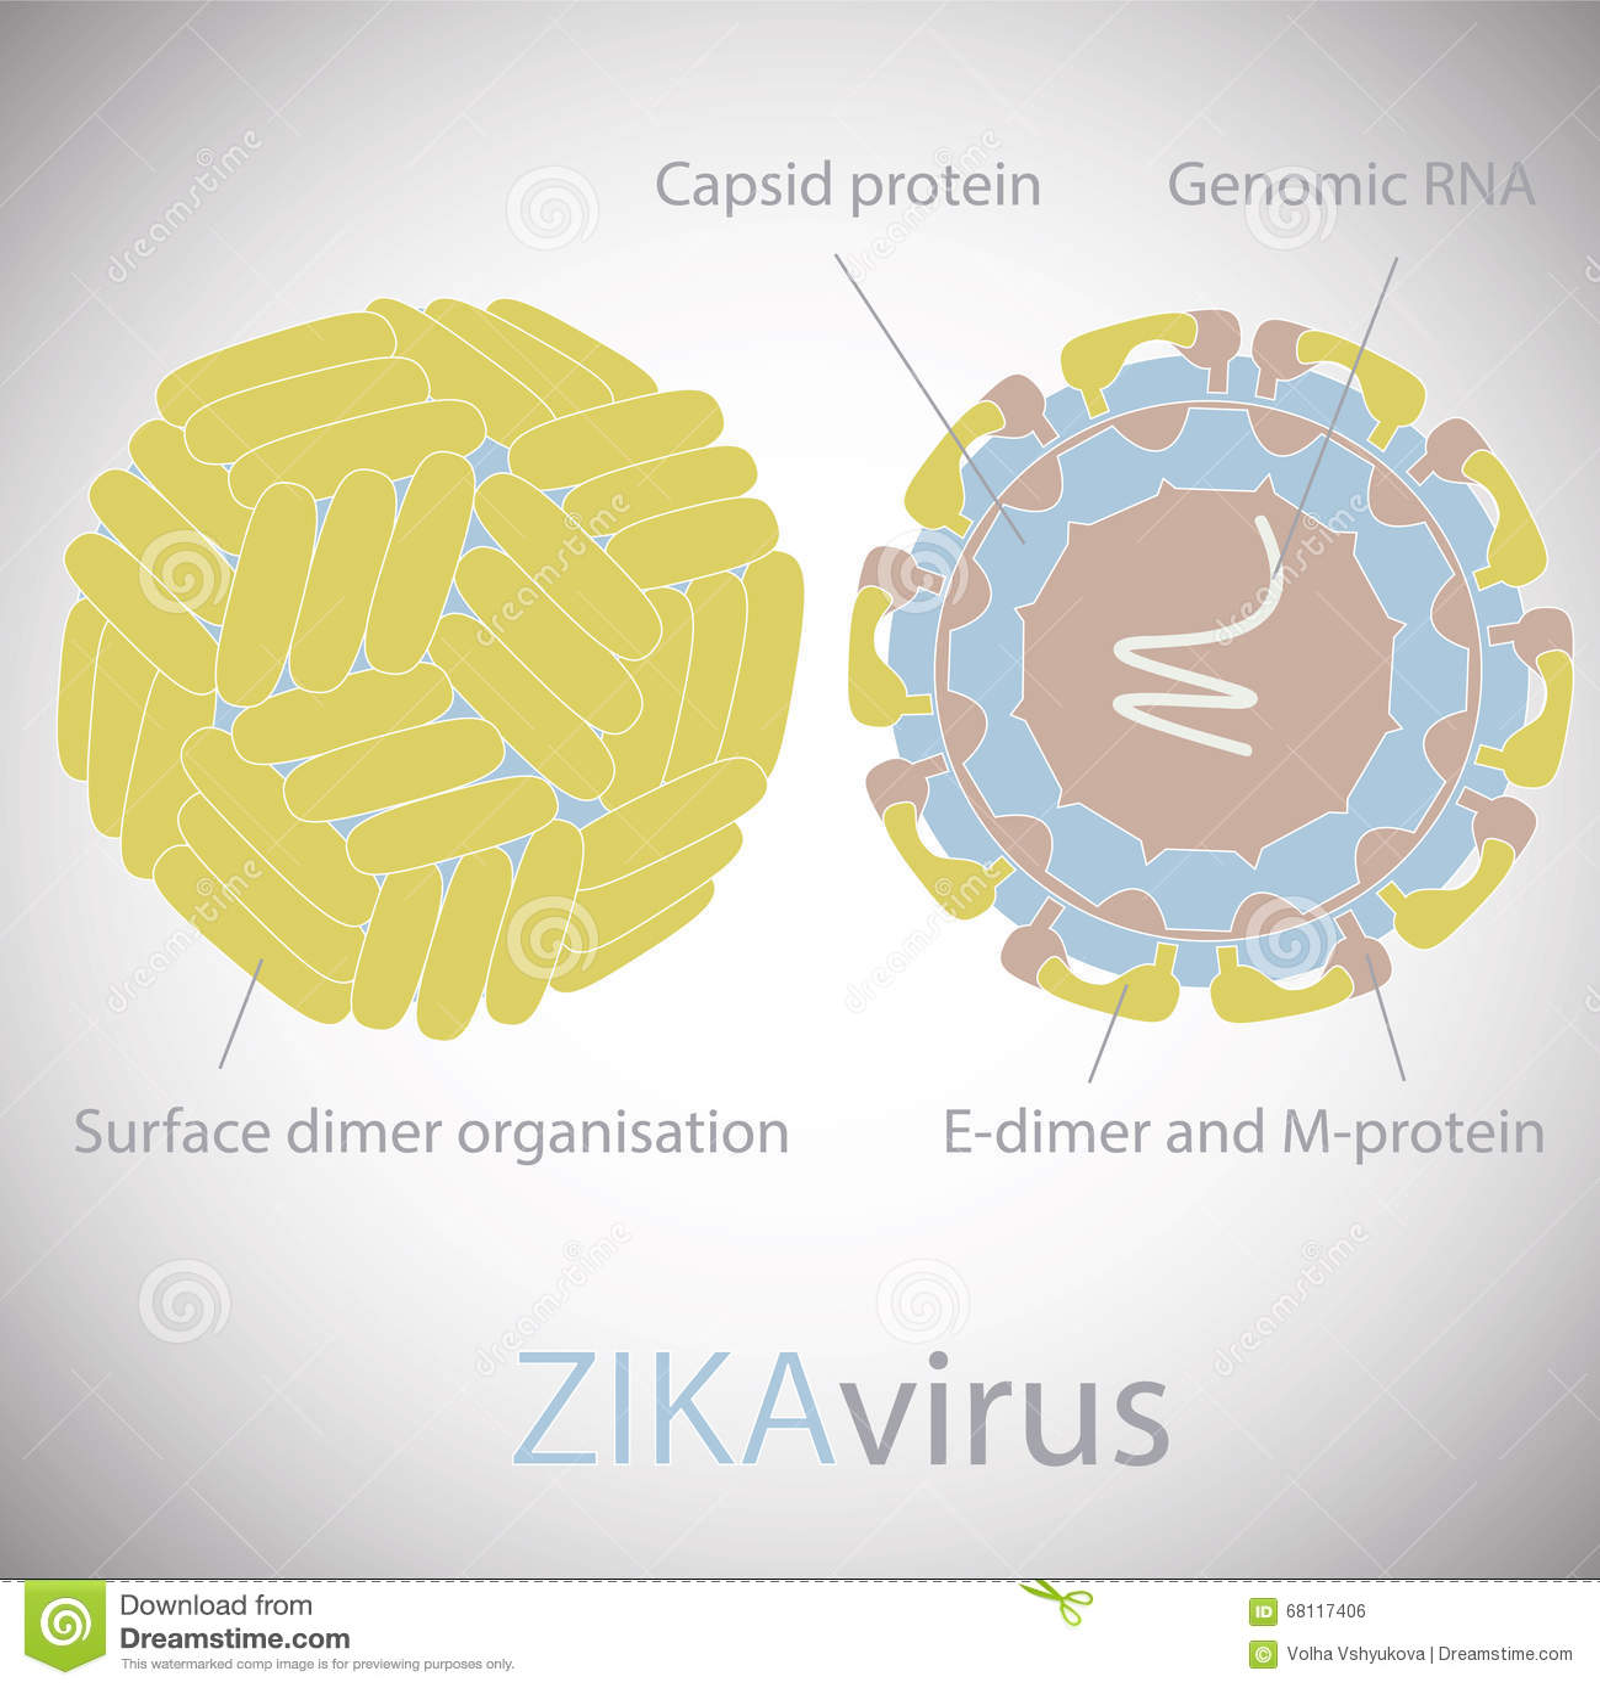 Structure Of Zika Virus Stock Vector - Image: 69037043